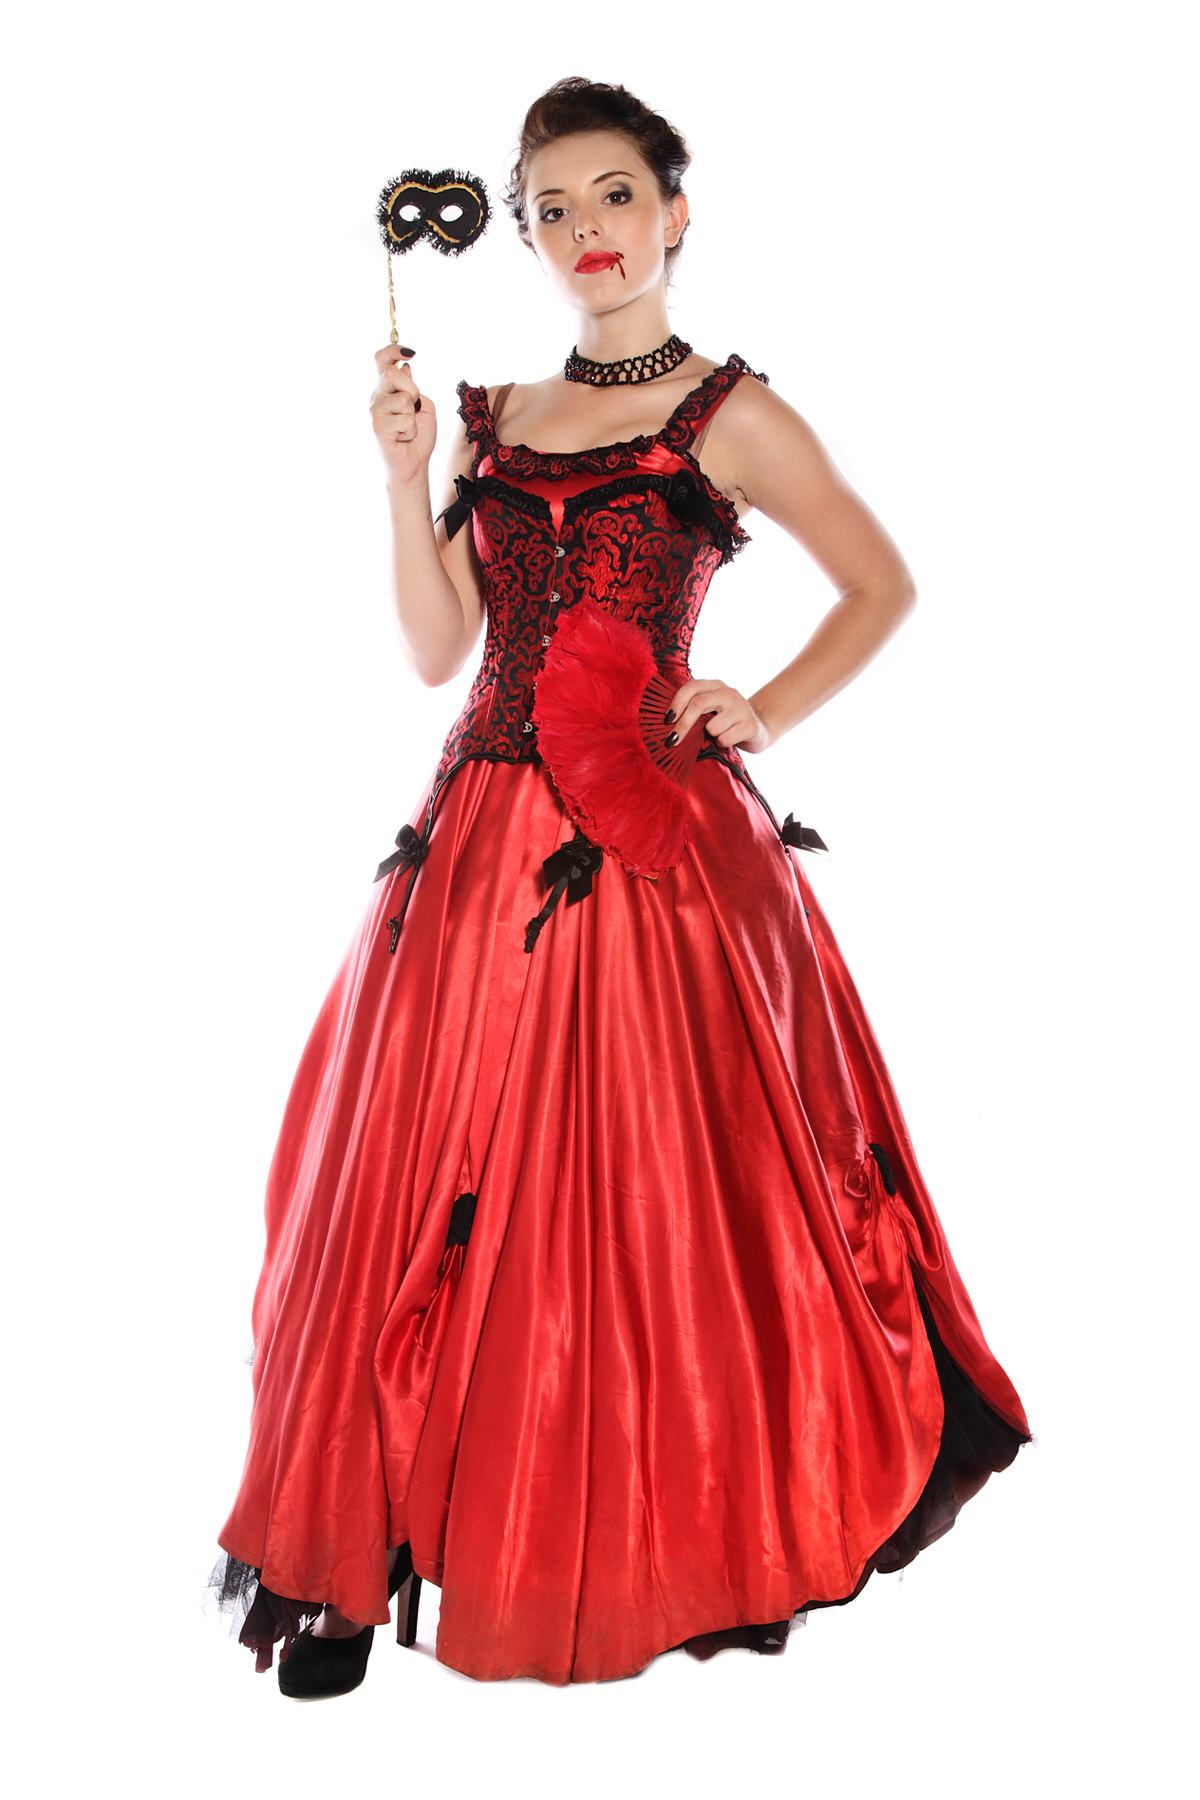 VAMPIRE PRINCESS LONG RED SATIN DRESS COSTUME